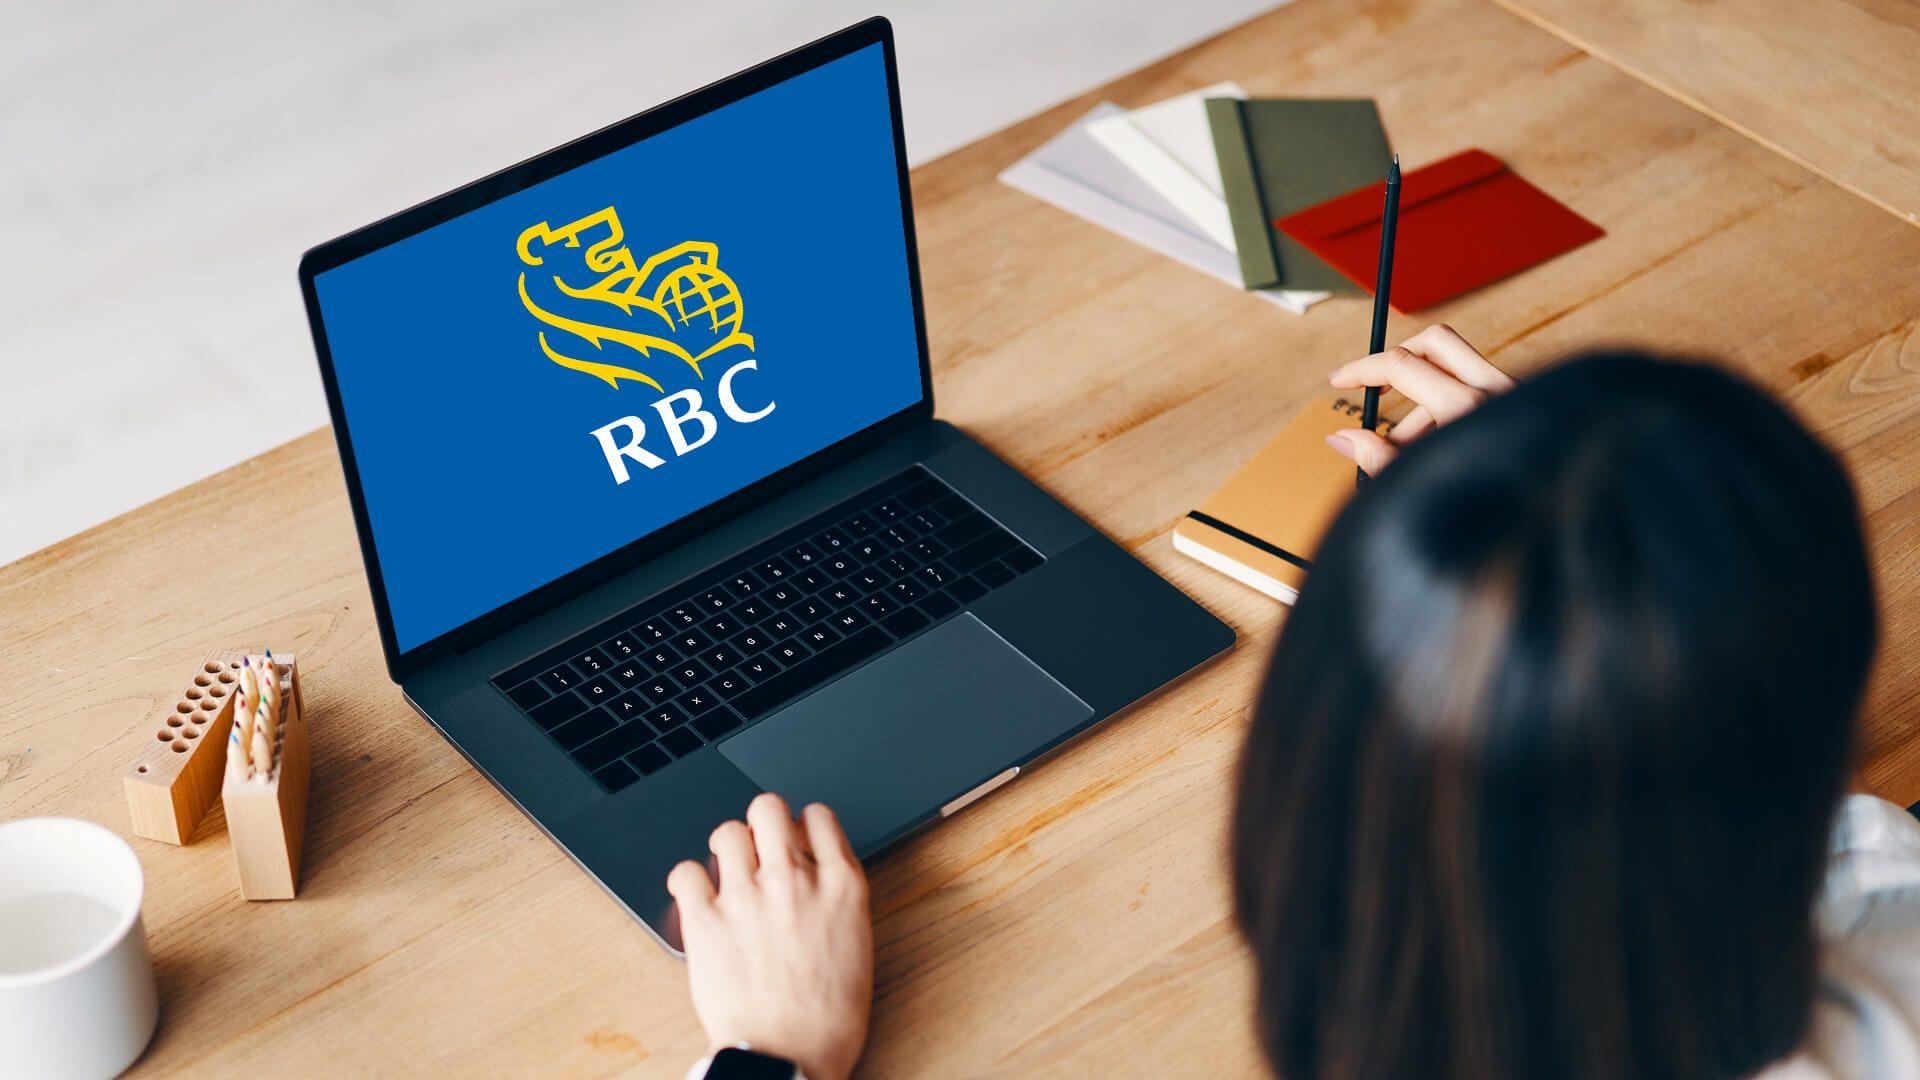 RBC bank computer login